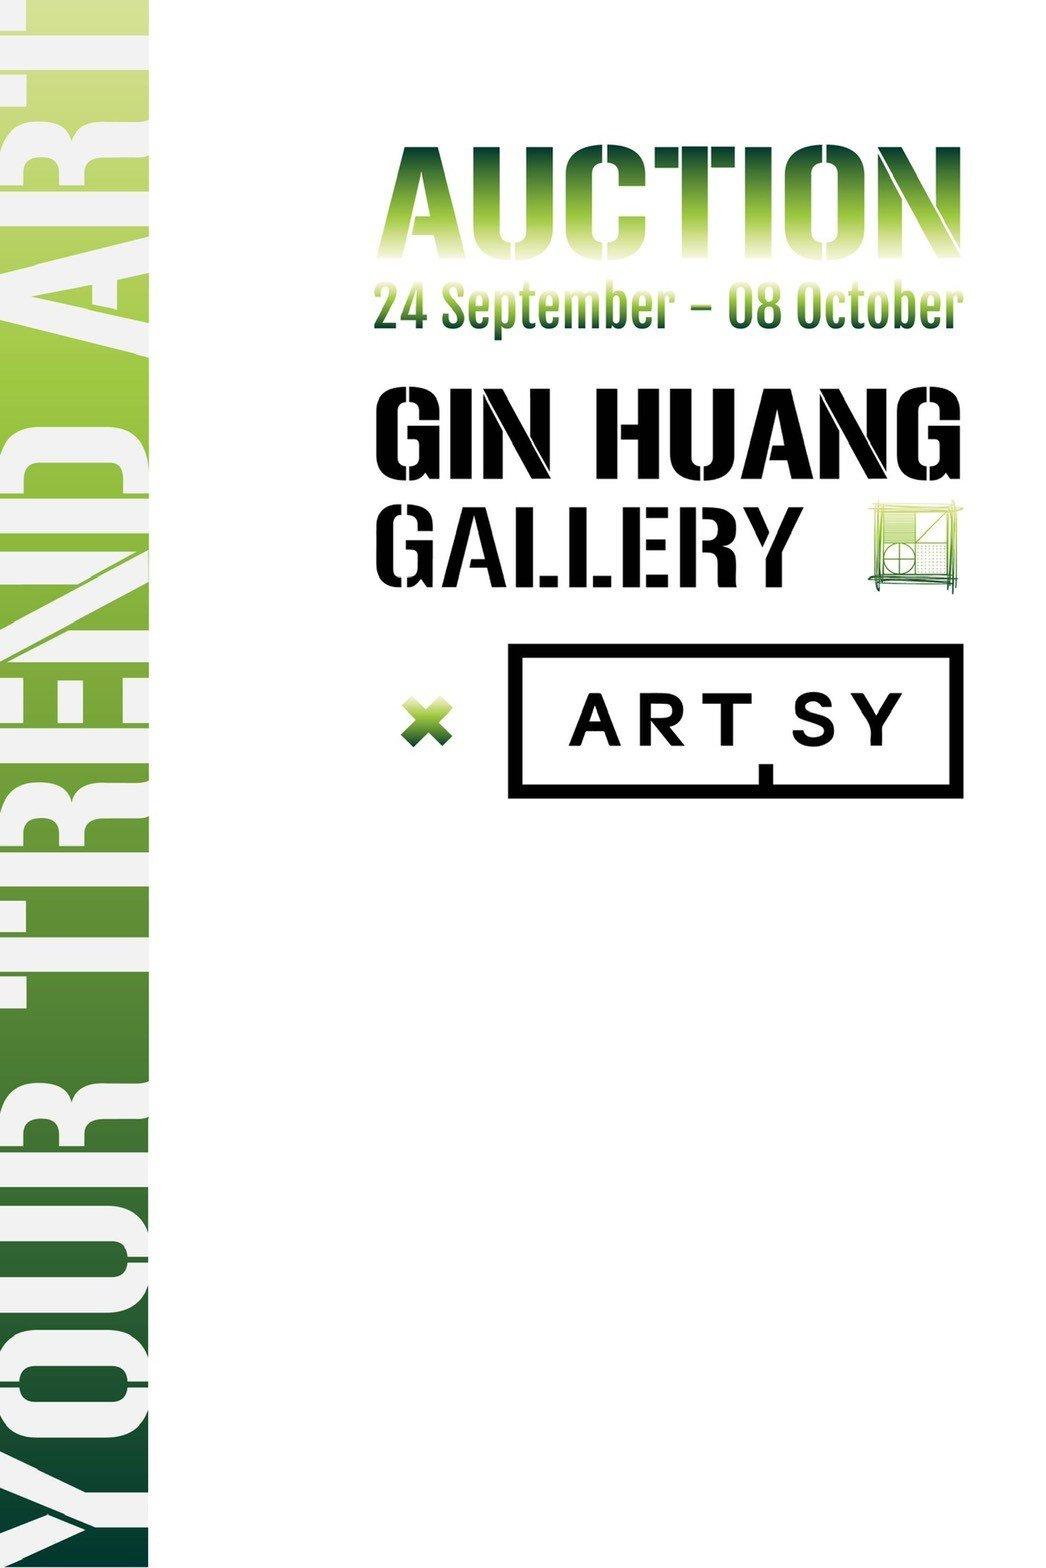 Gin Huang Gallery X ARTSY